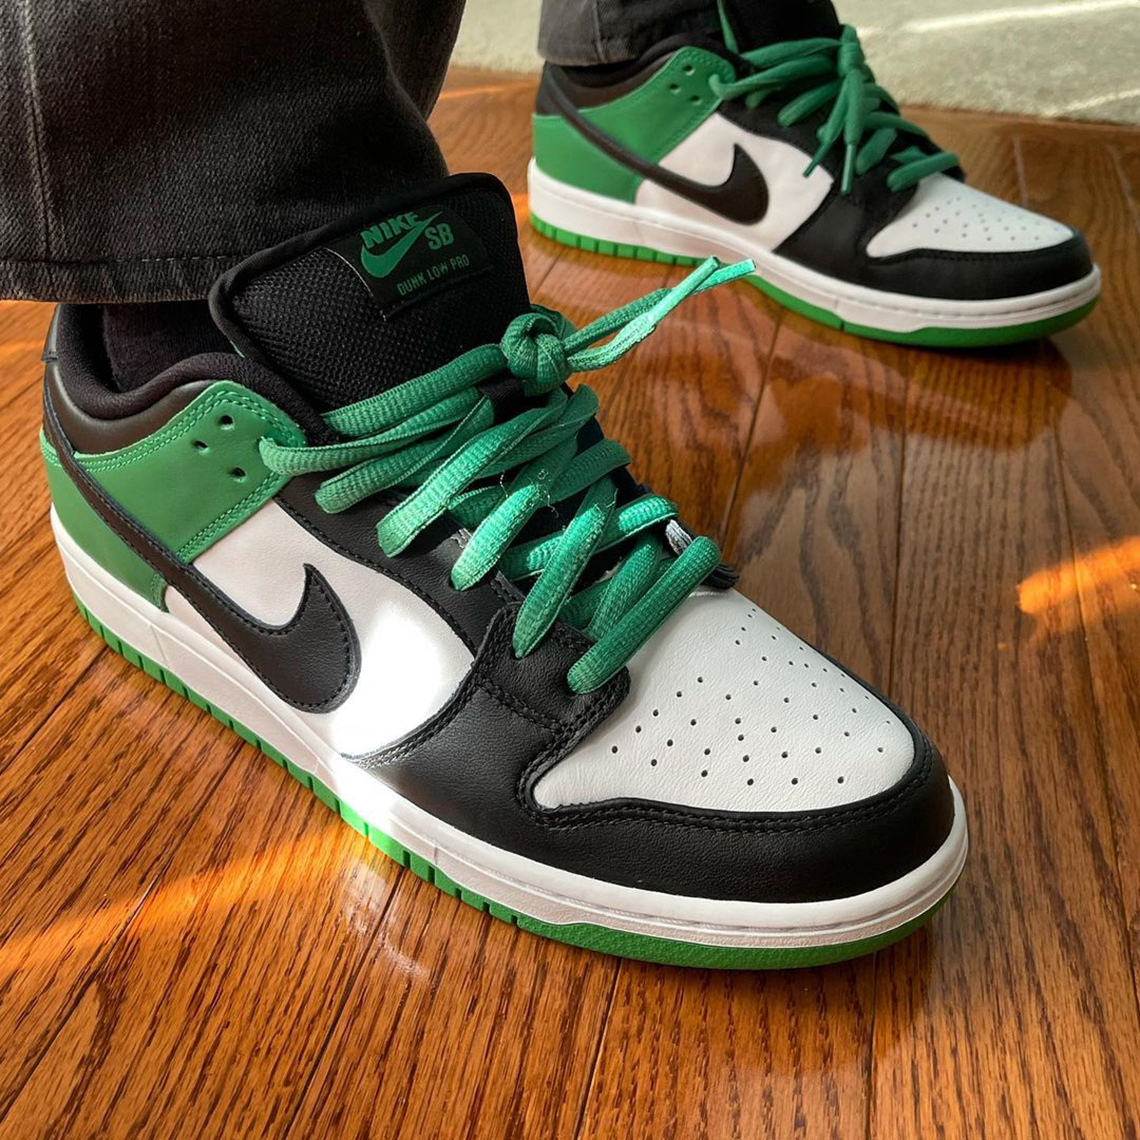 Nike SB Dunk Low J-Pack Celtics Release Info - Crumpe